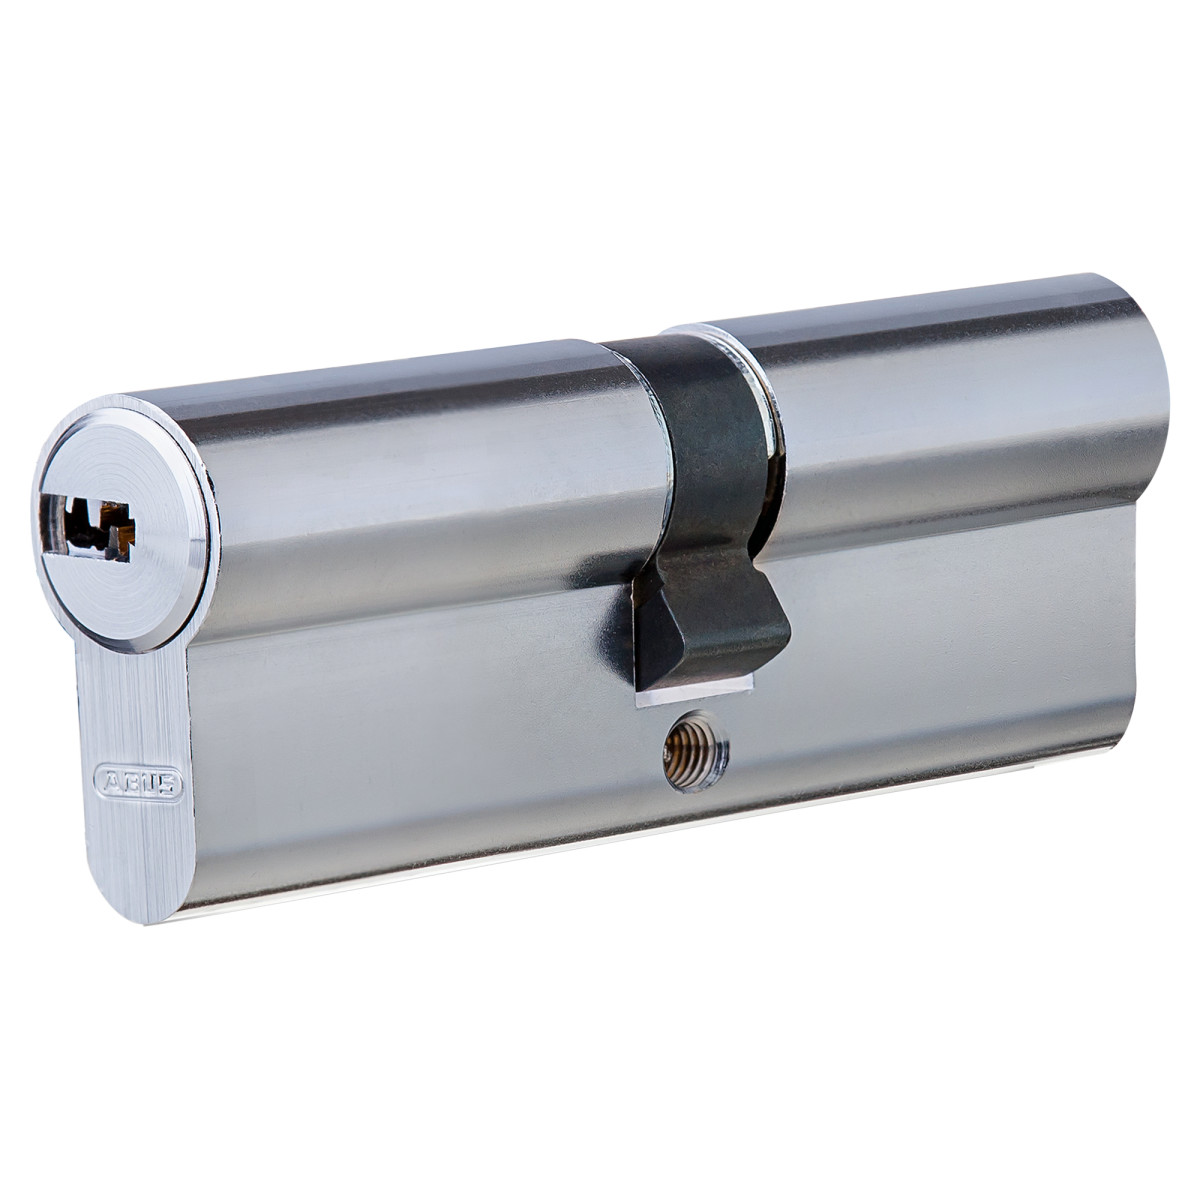 Цилиндр Abus 40х40 мм ключ/ключ цвет никель